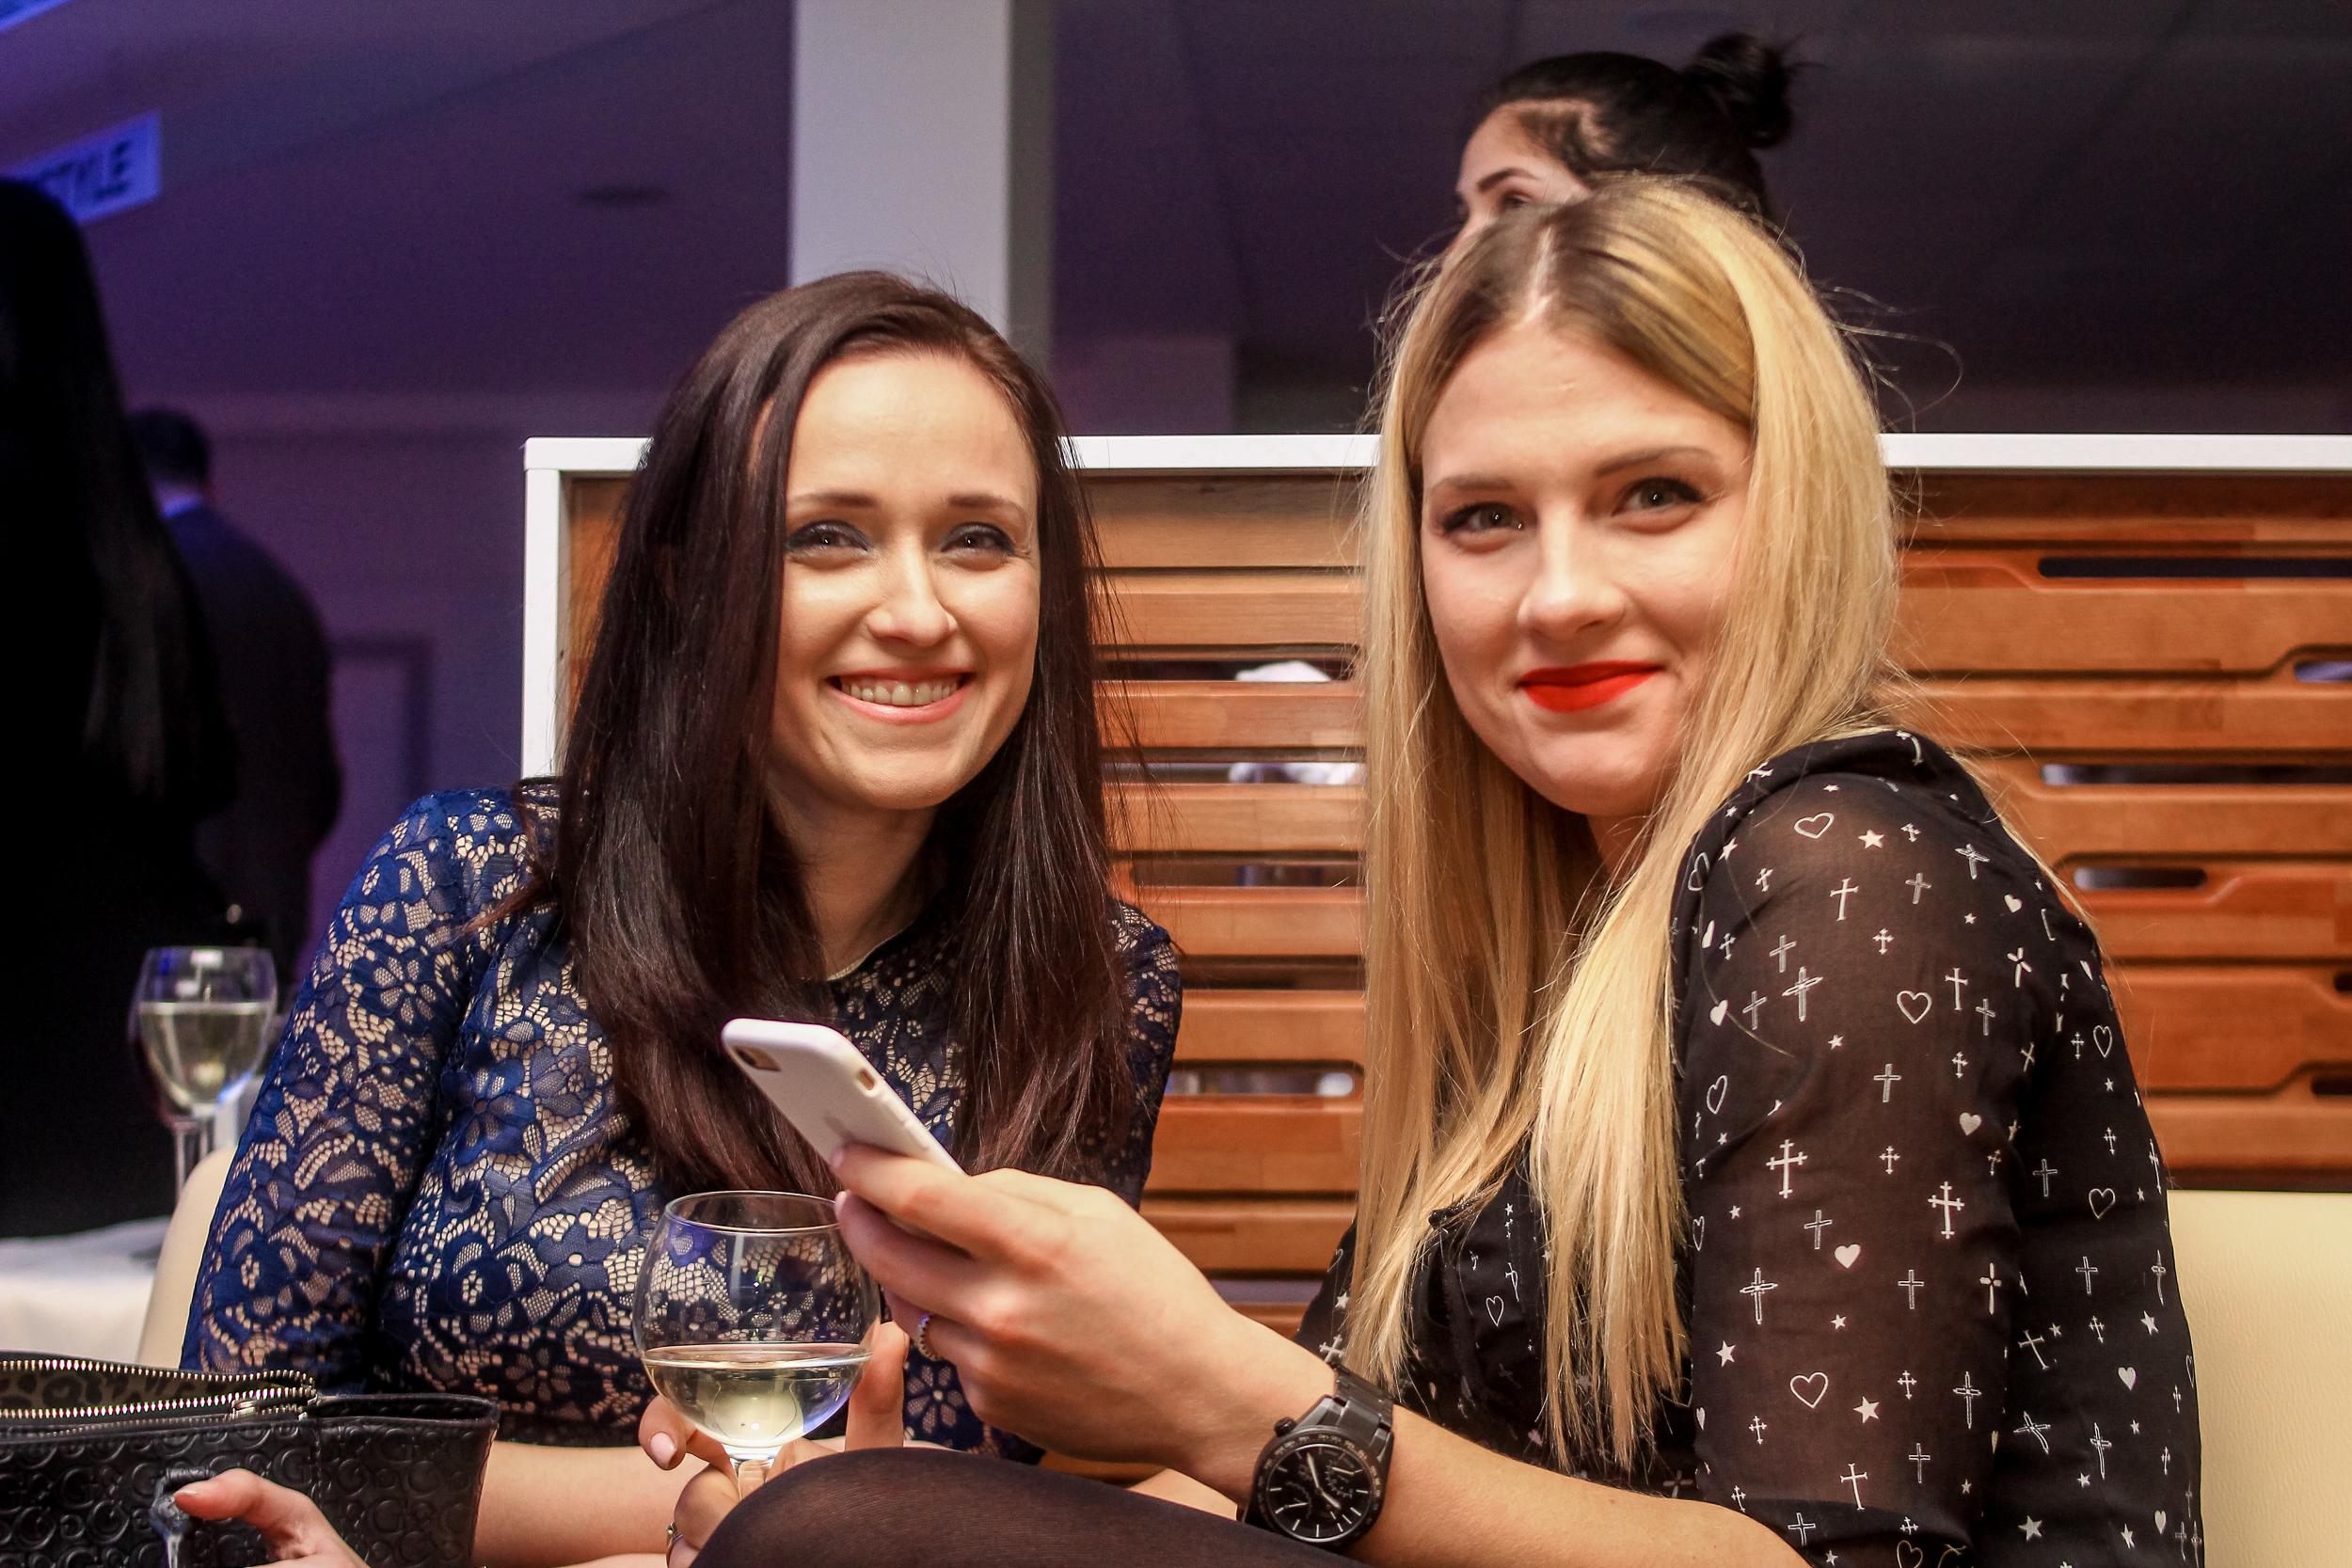 Ольга Харлан с подругой на презентации BMW Николаев